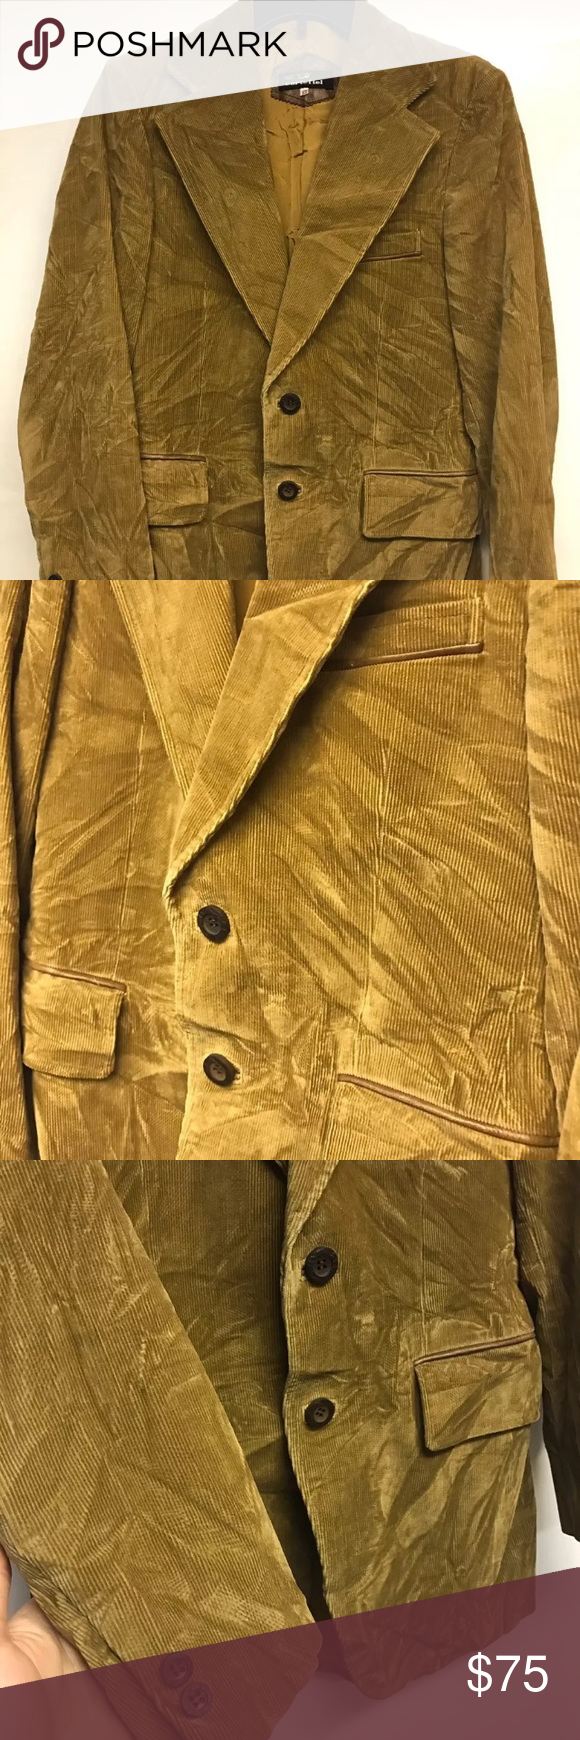 Vintage Cortefiel Corduroy Suede Gold Jacket 37 Men's size